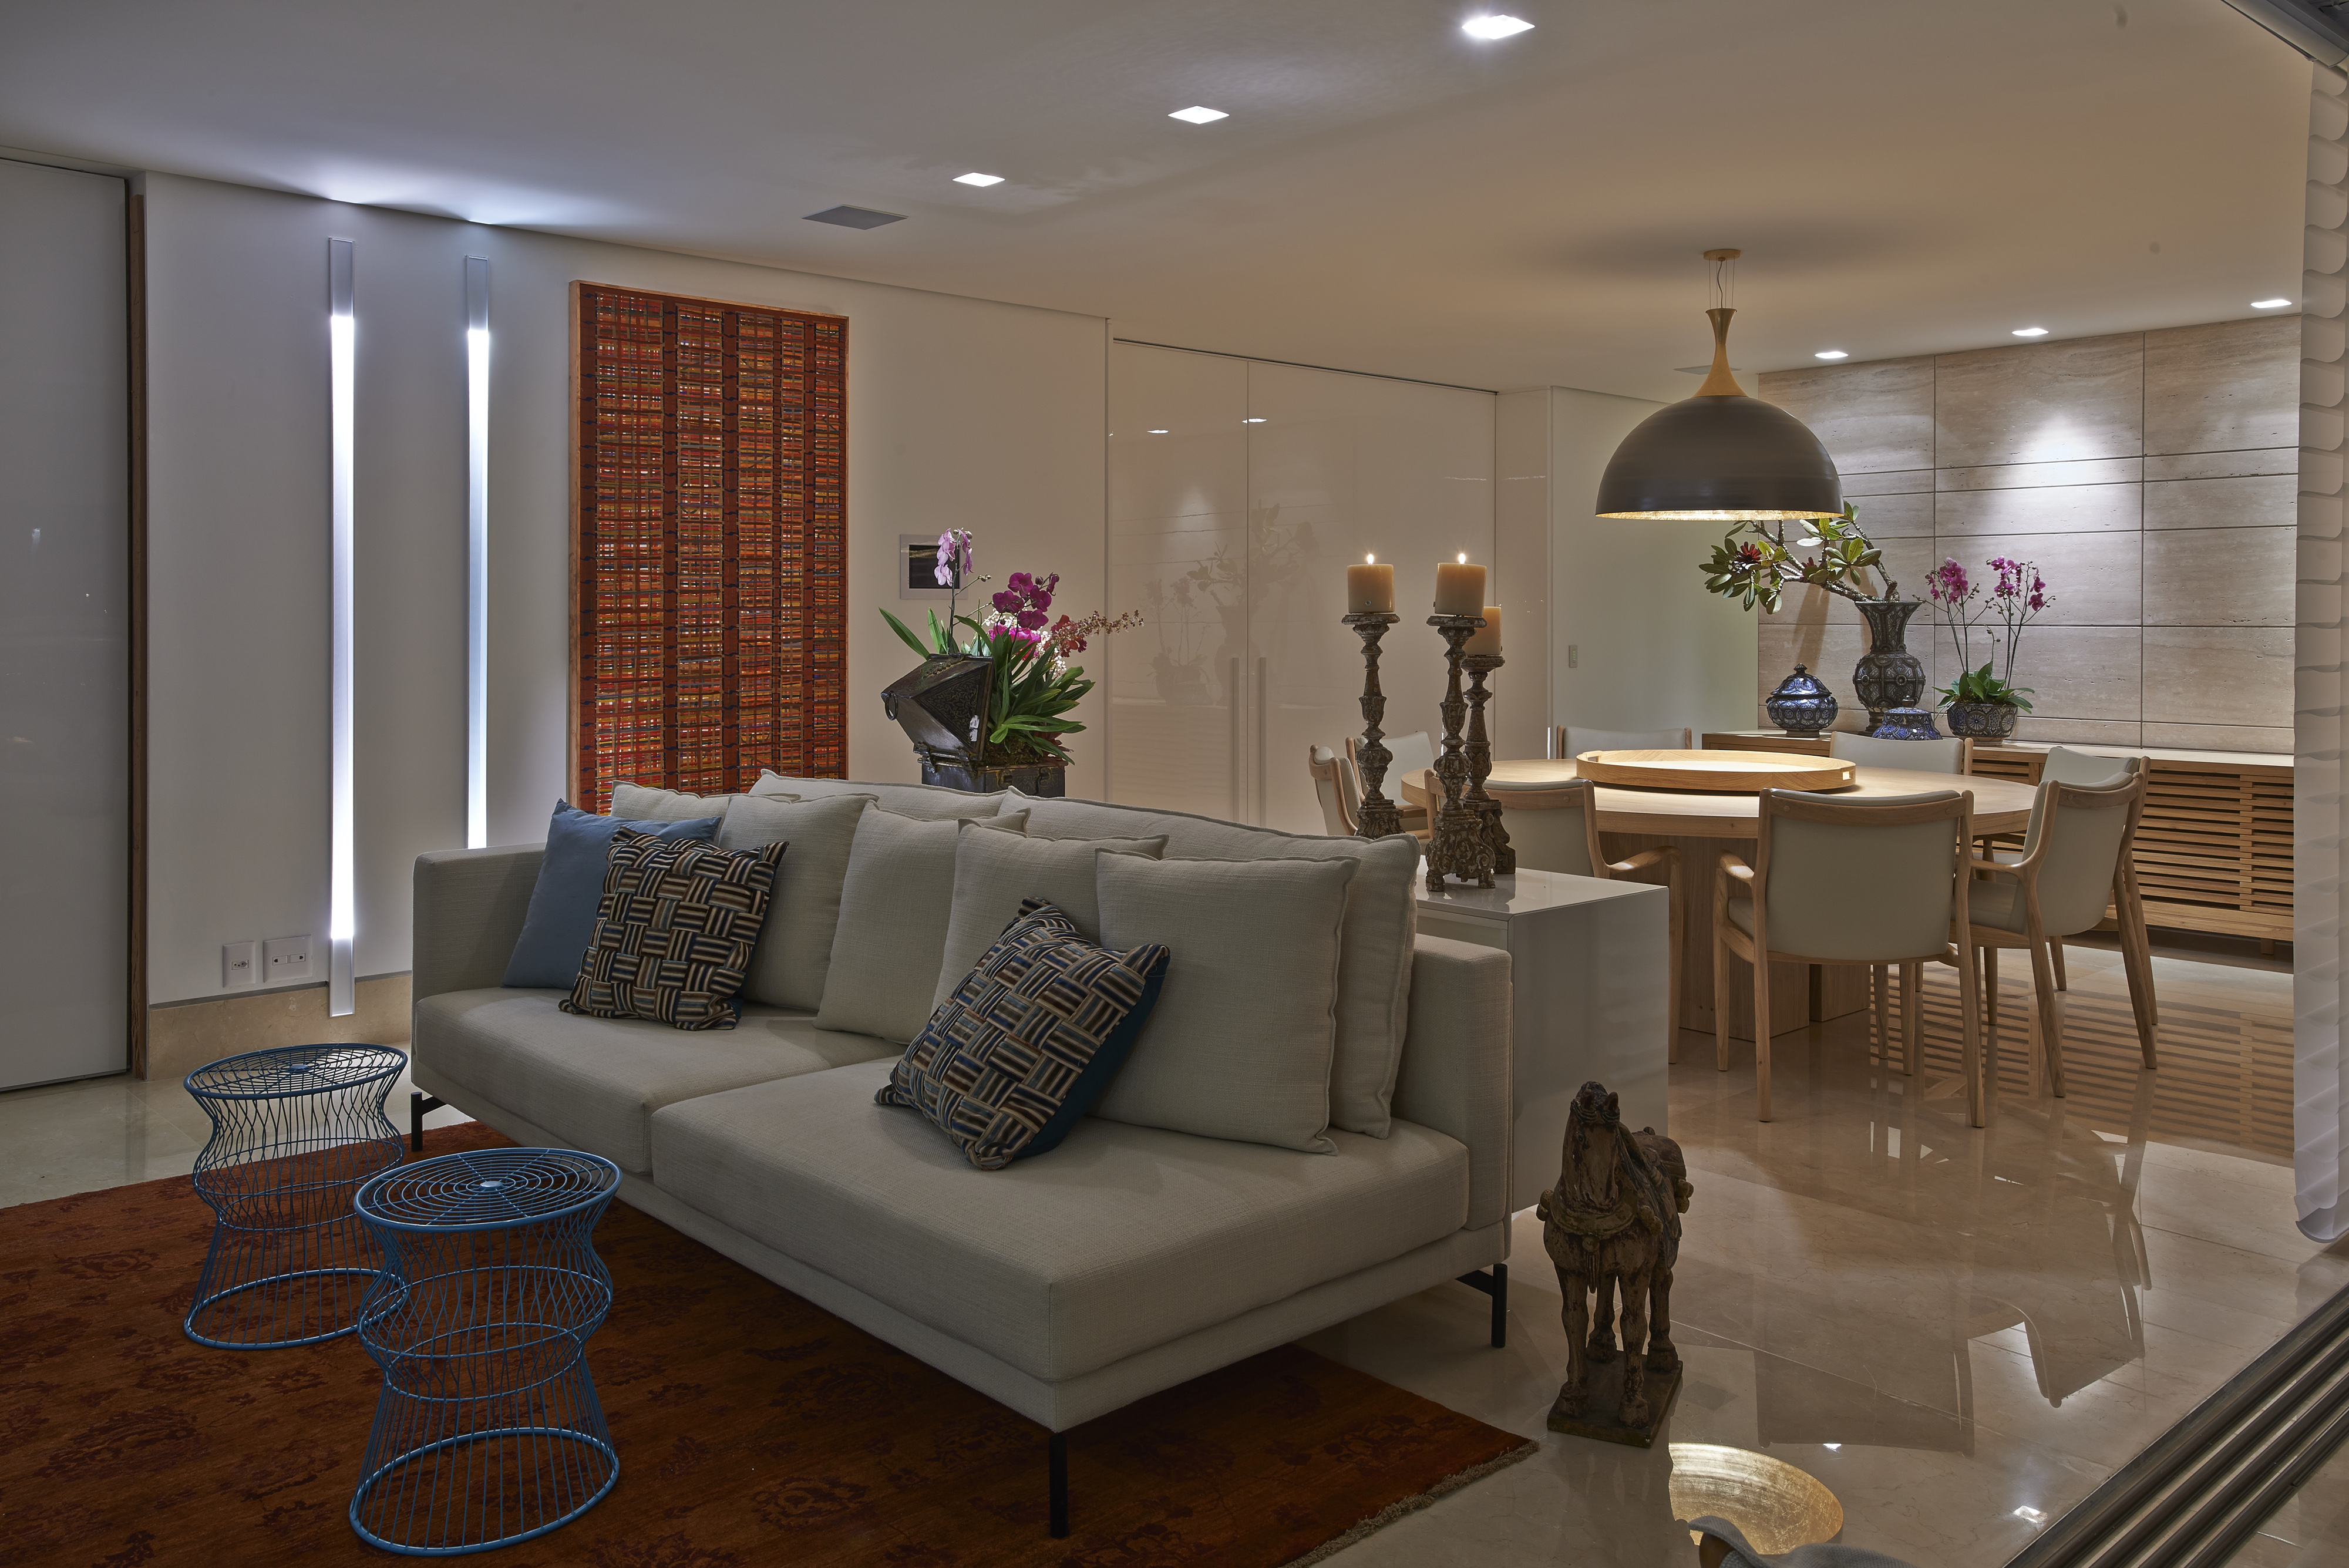 jantar Lotus (ETEL) e Buffet Cascaldi em laca Warm Grey por Adresse #836A48 4000x2670